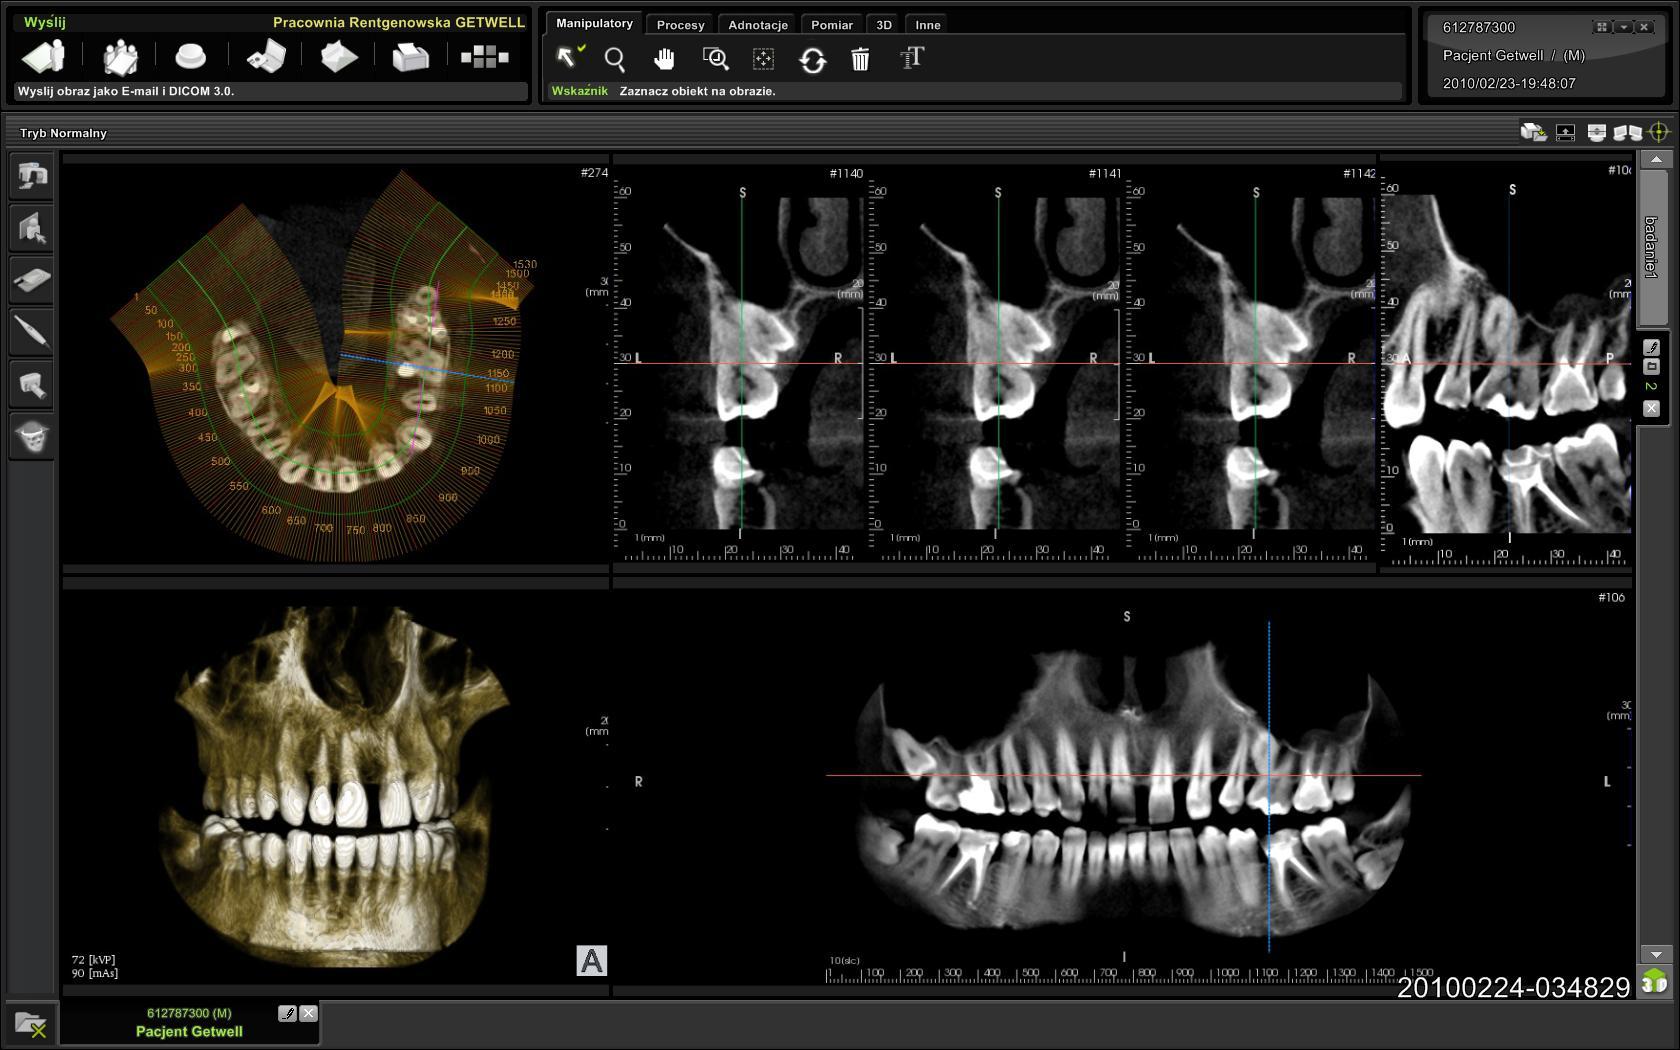 tomografia żoliborz